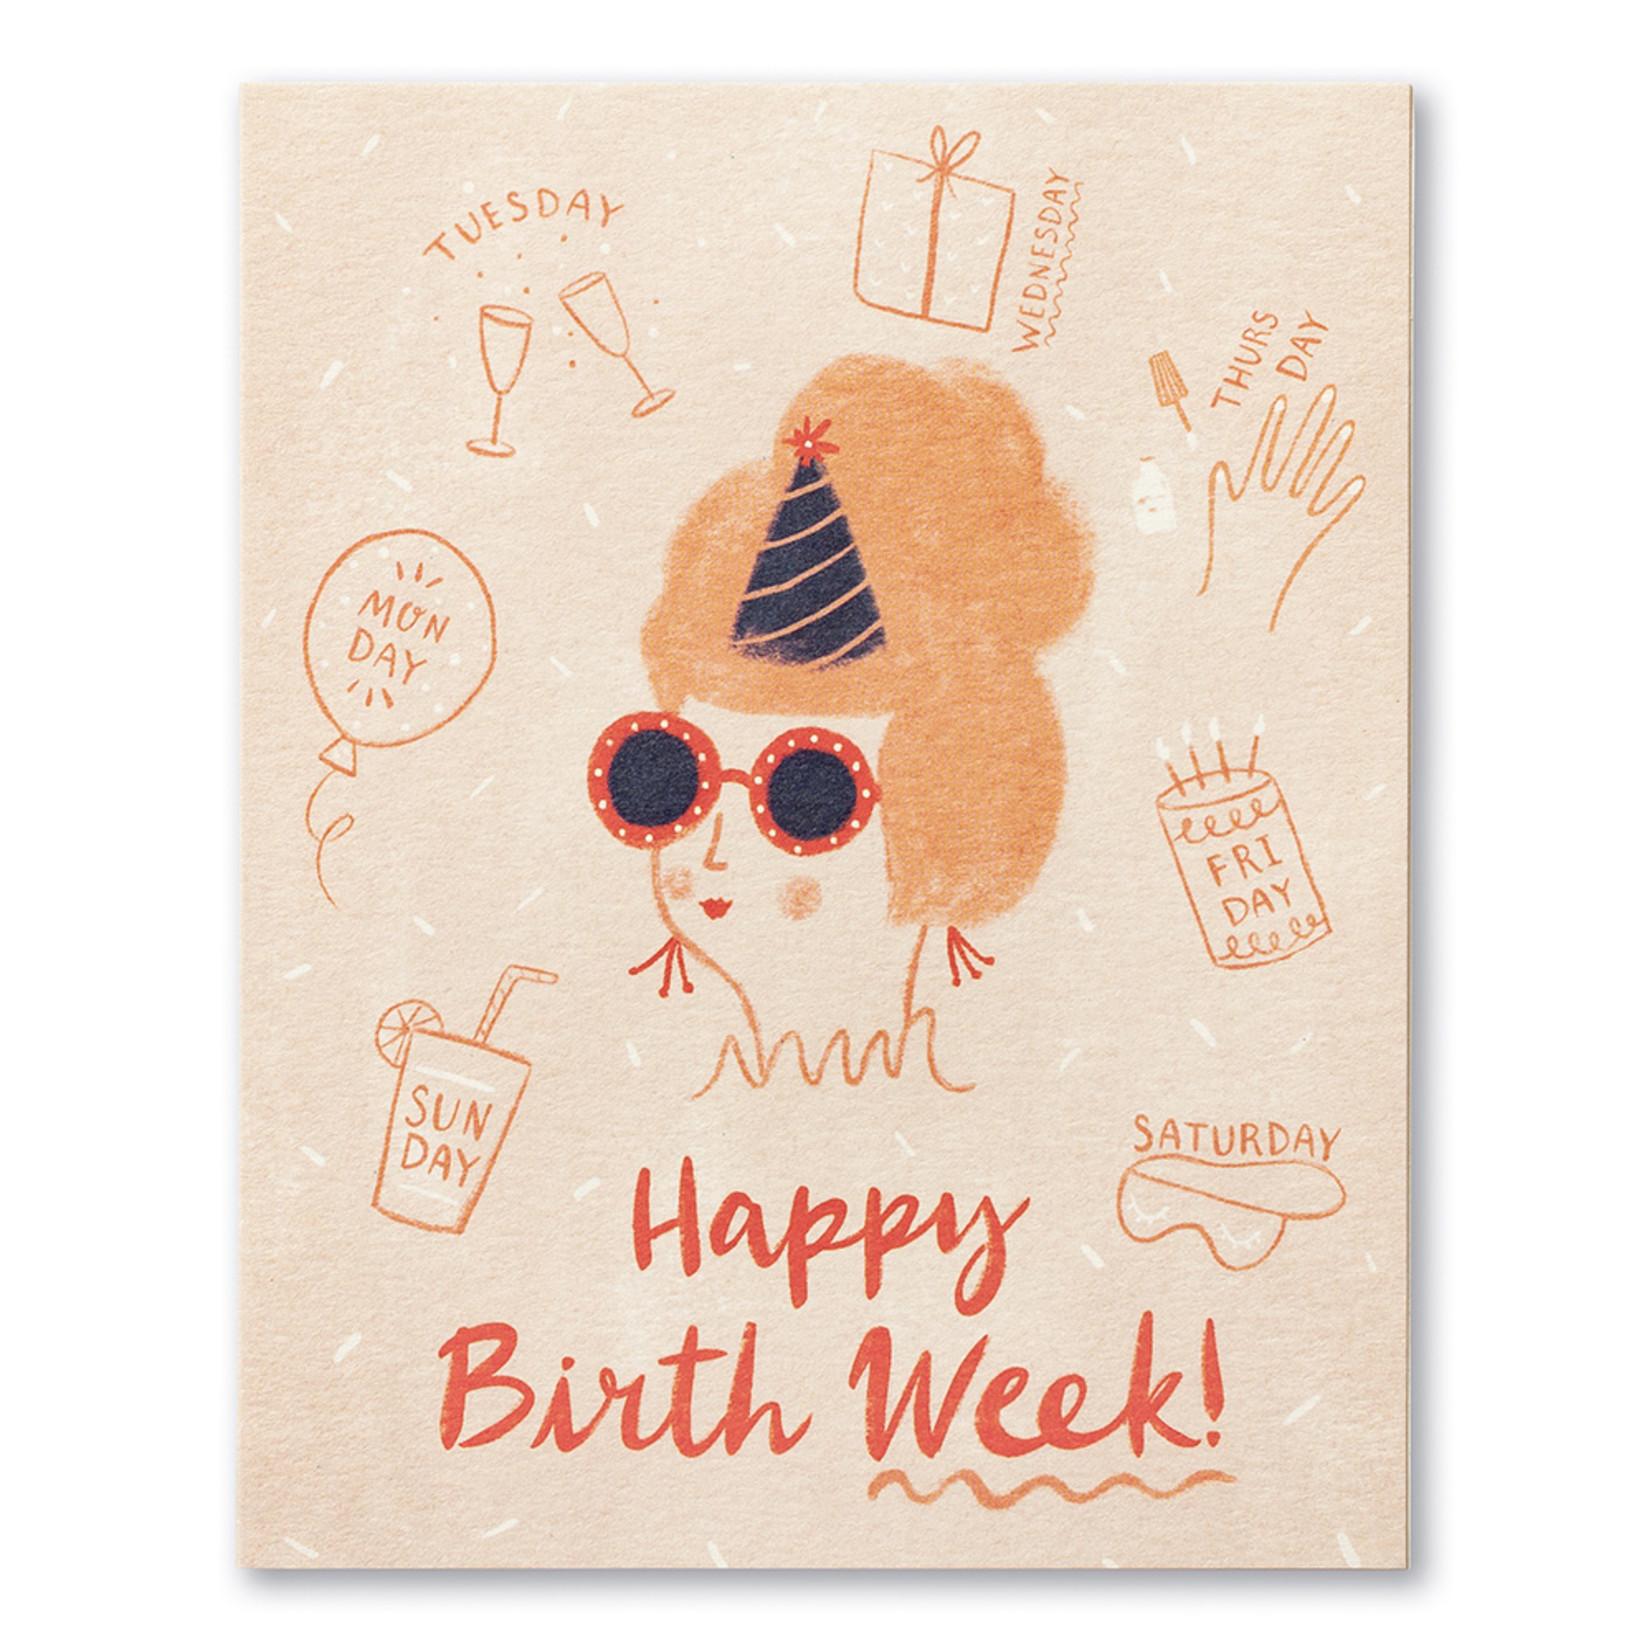 Love Muchly Happy Birth Week!